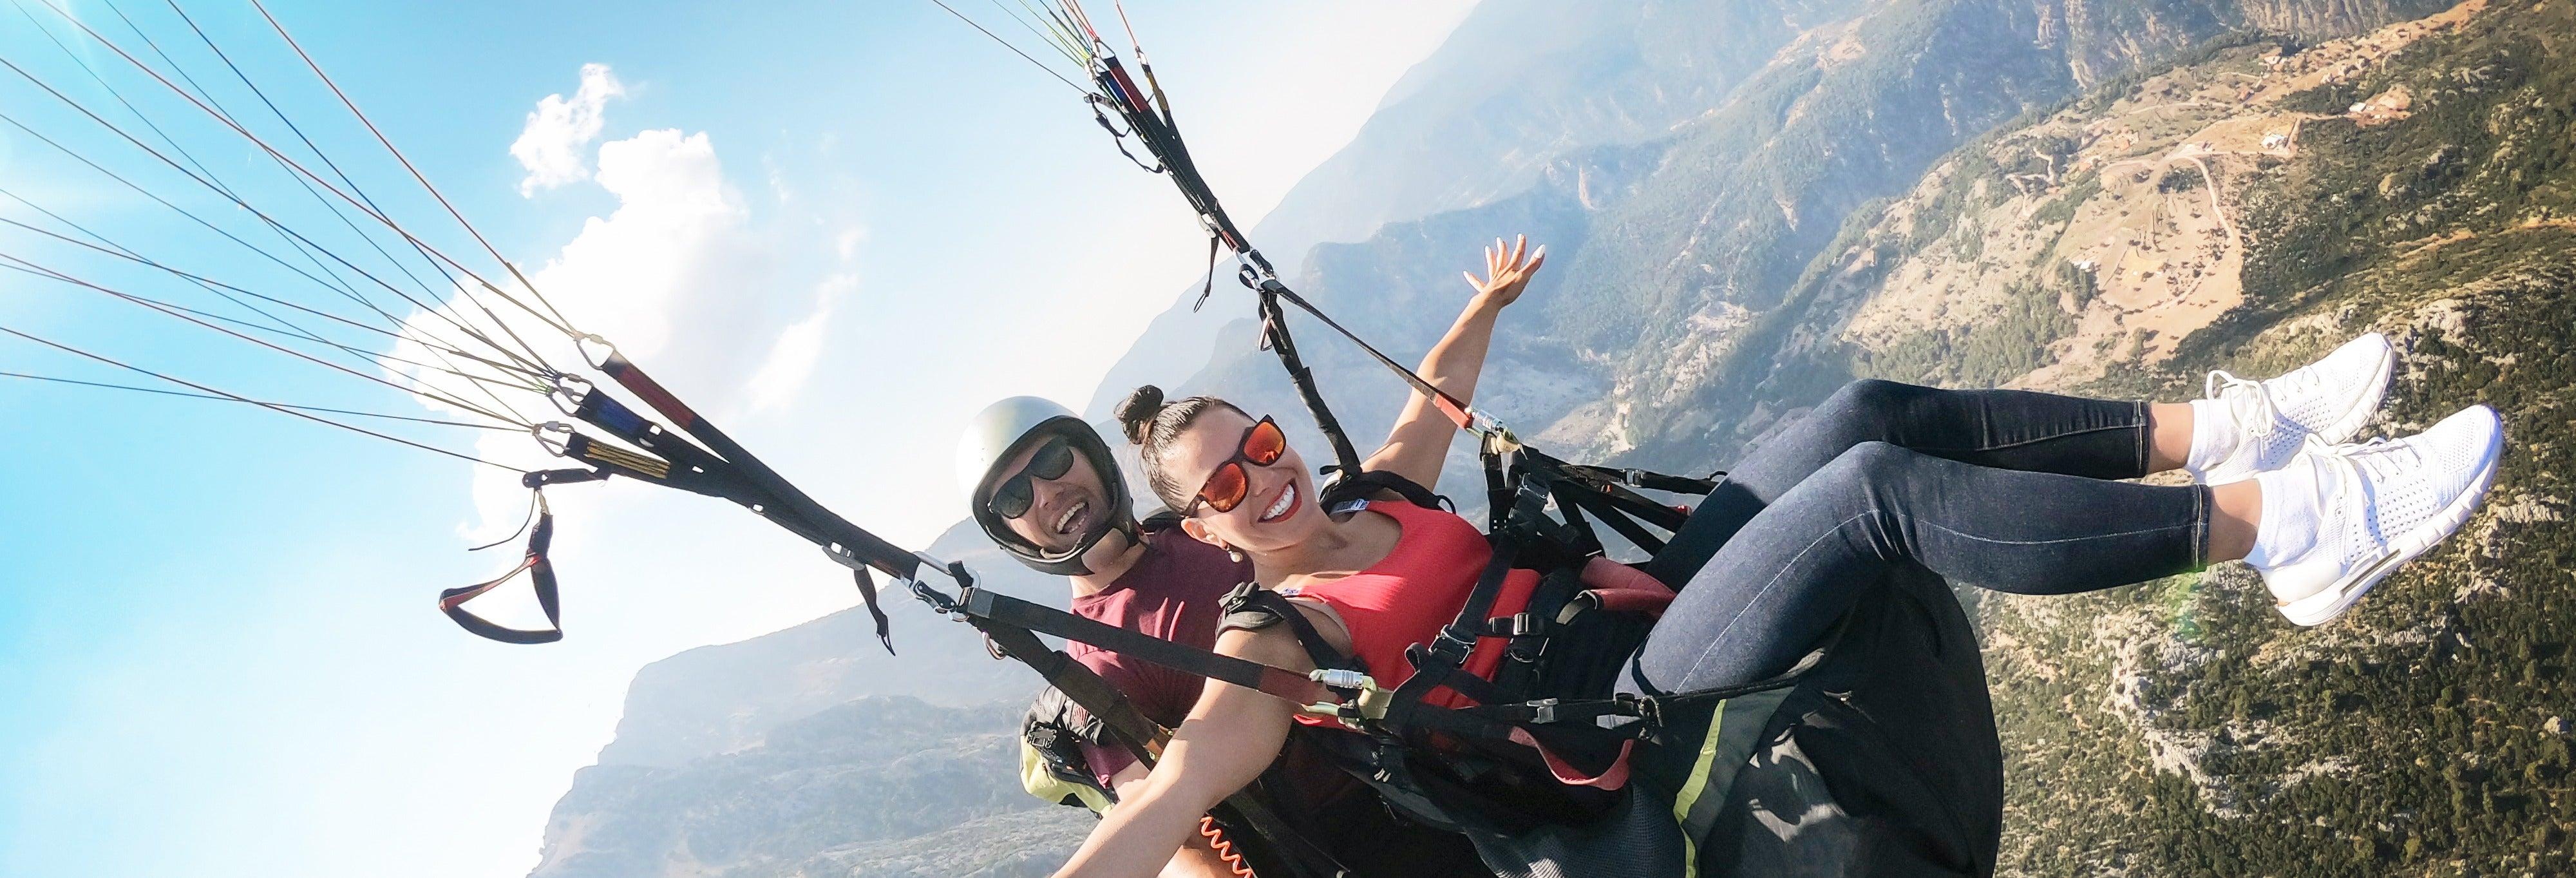 Paragliding in Jarabacoa